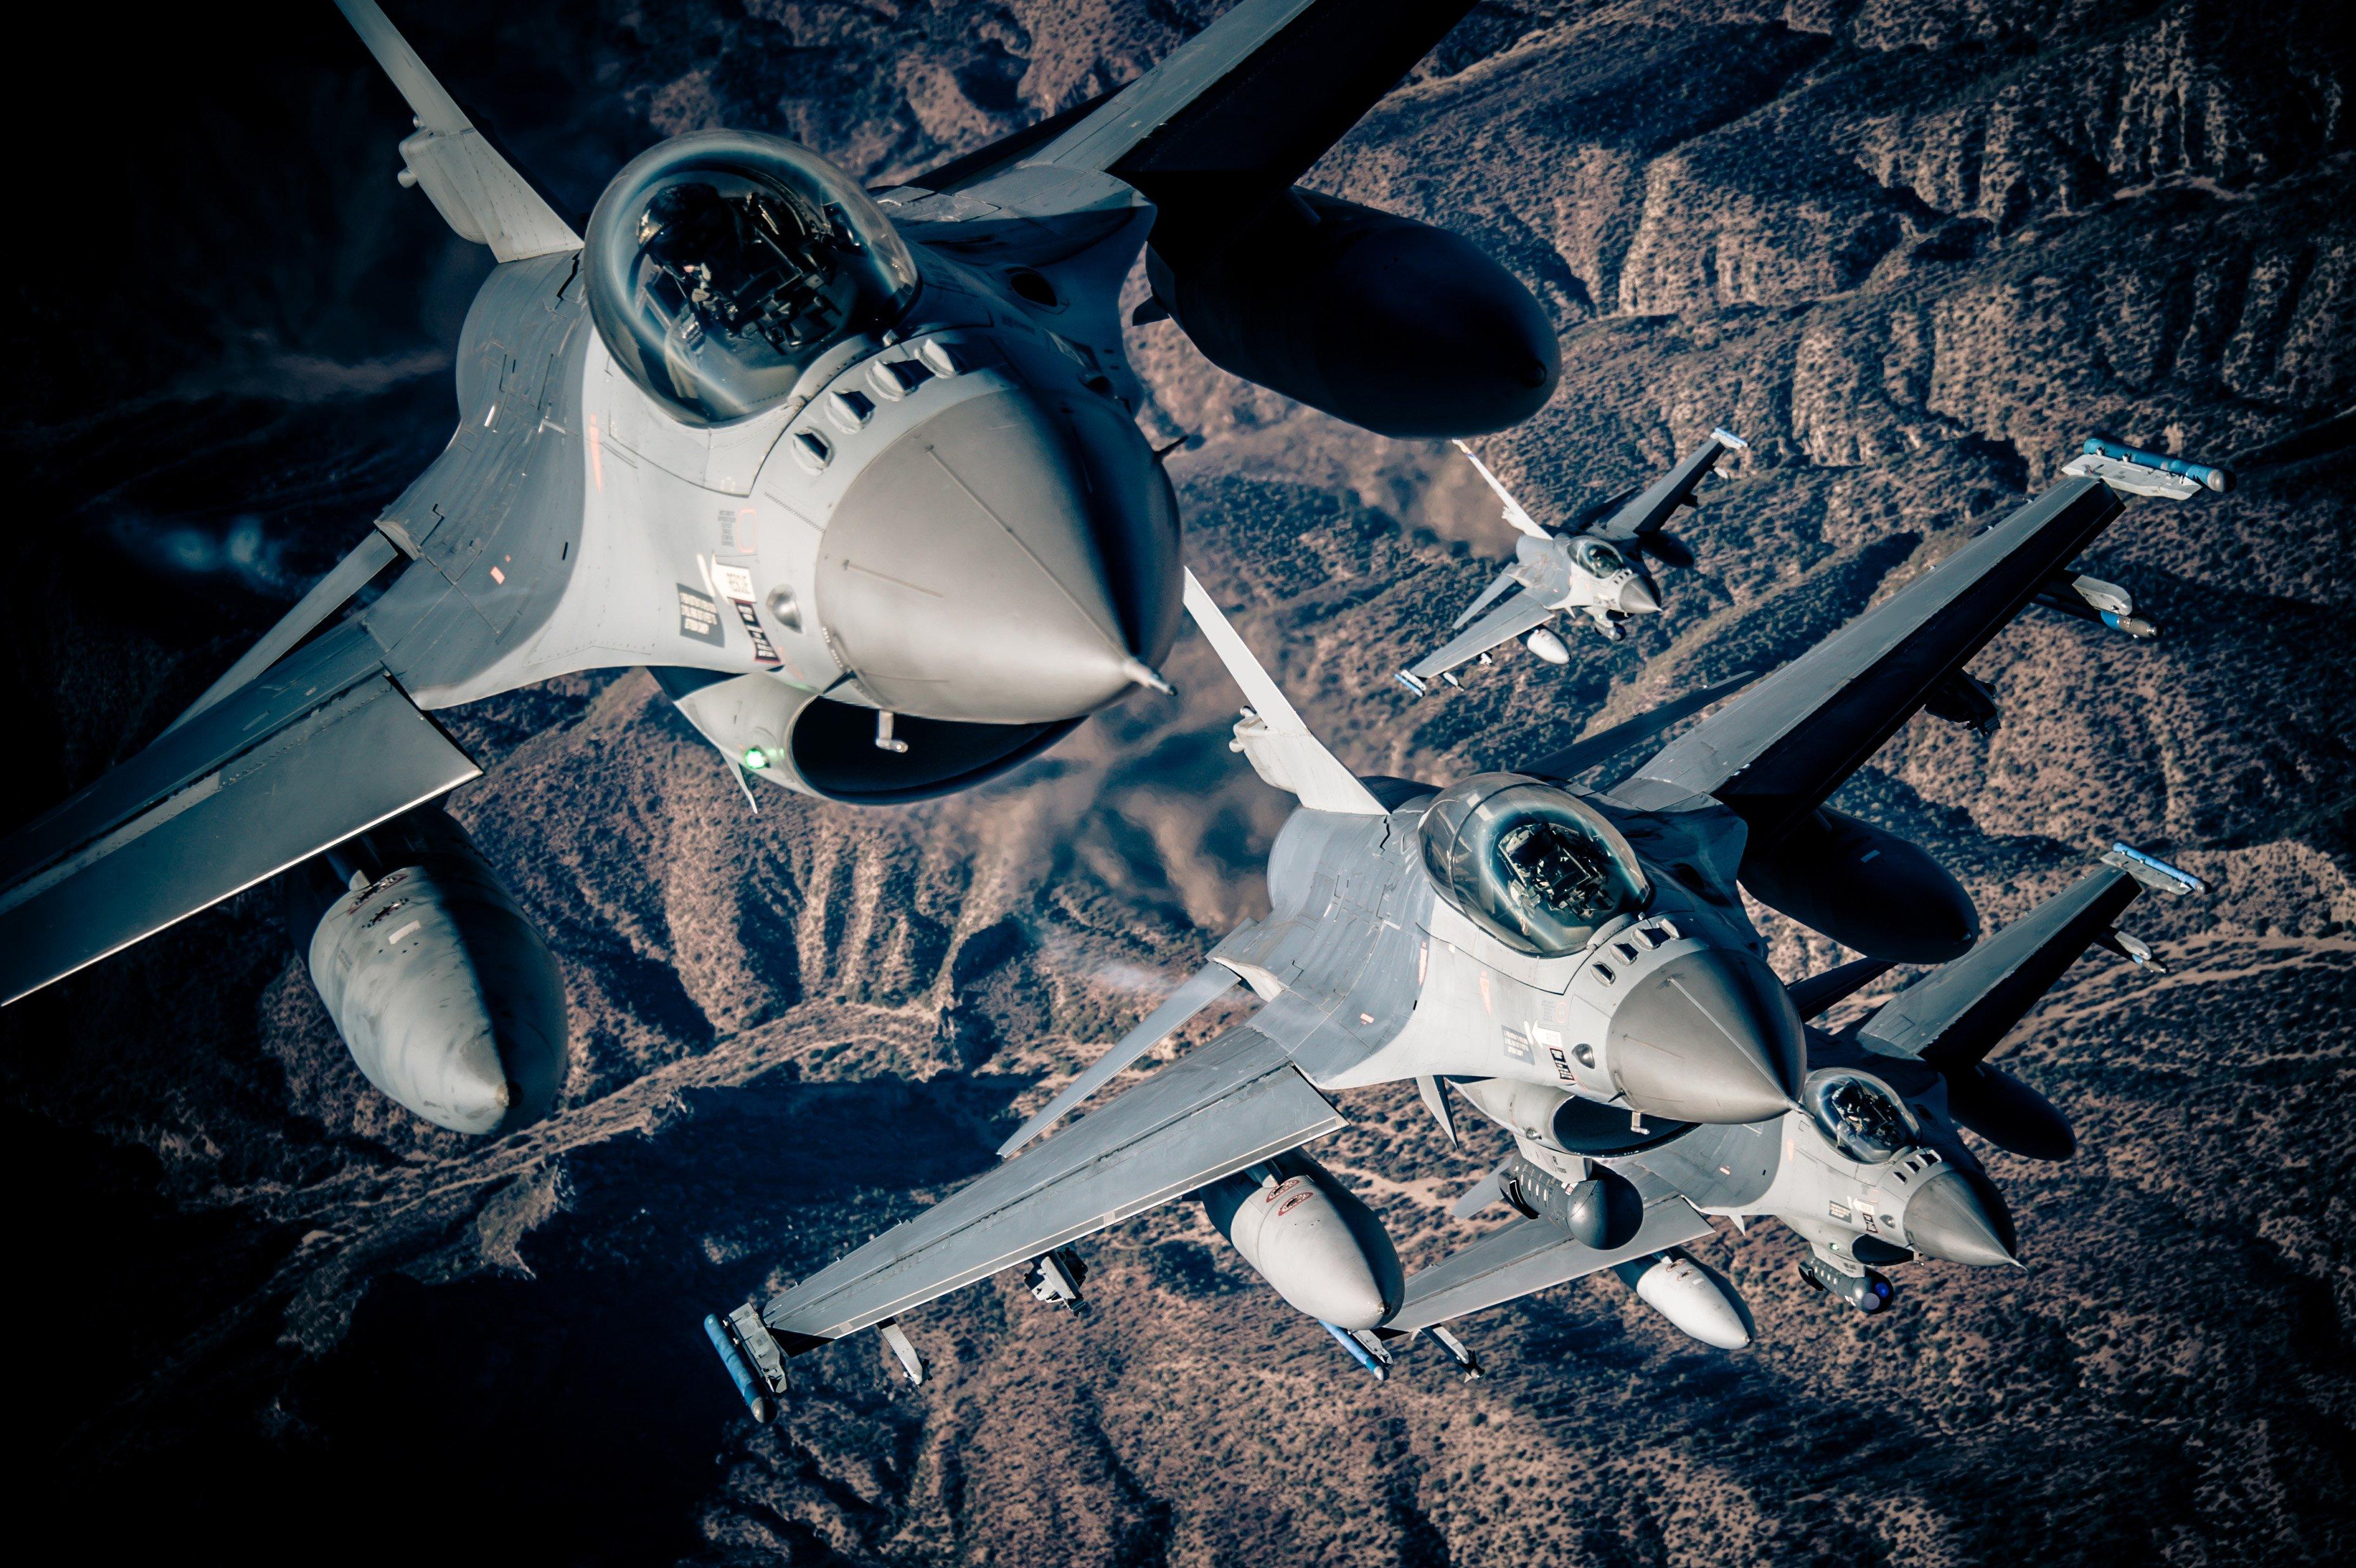 F-16s [Northrop Grumman]